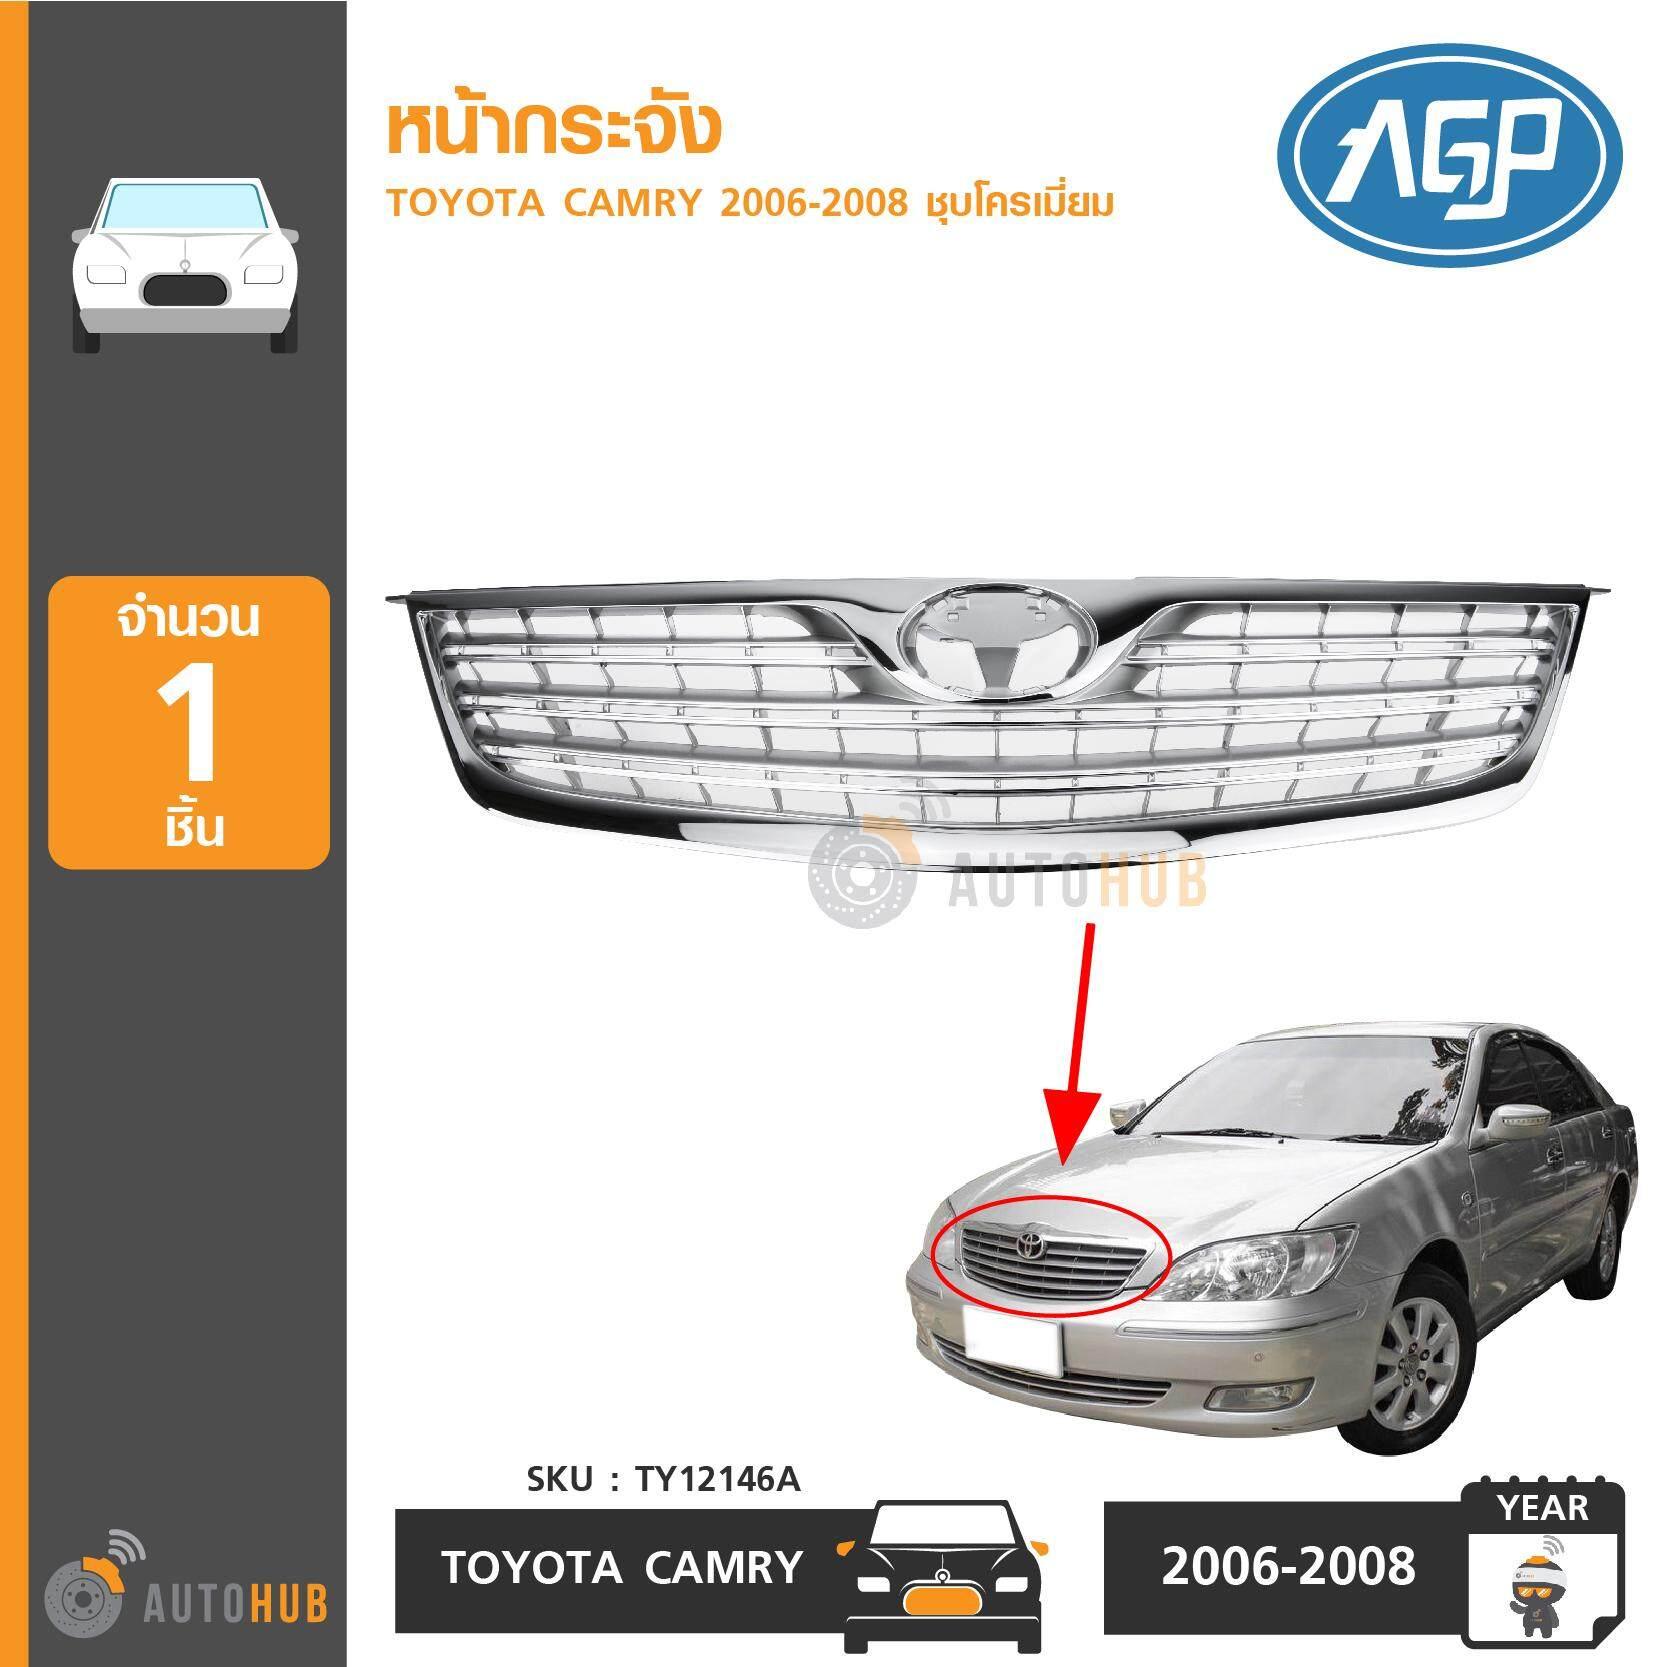 Agp หน้ากระจัง Toyota Camry Acv40 ปี 2006- 2008 ชุบโครเมี่ยม (ty12146a) By Autohub.